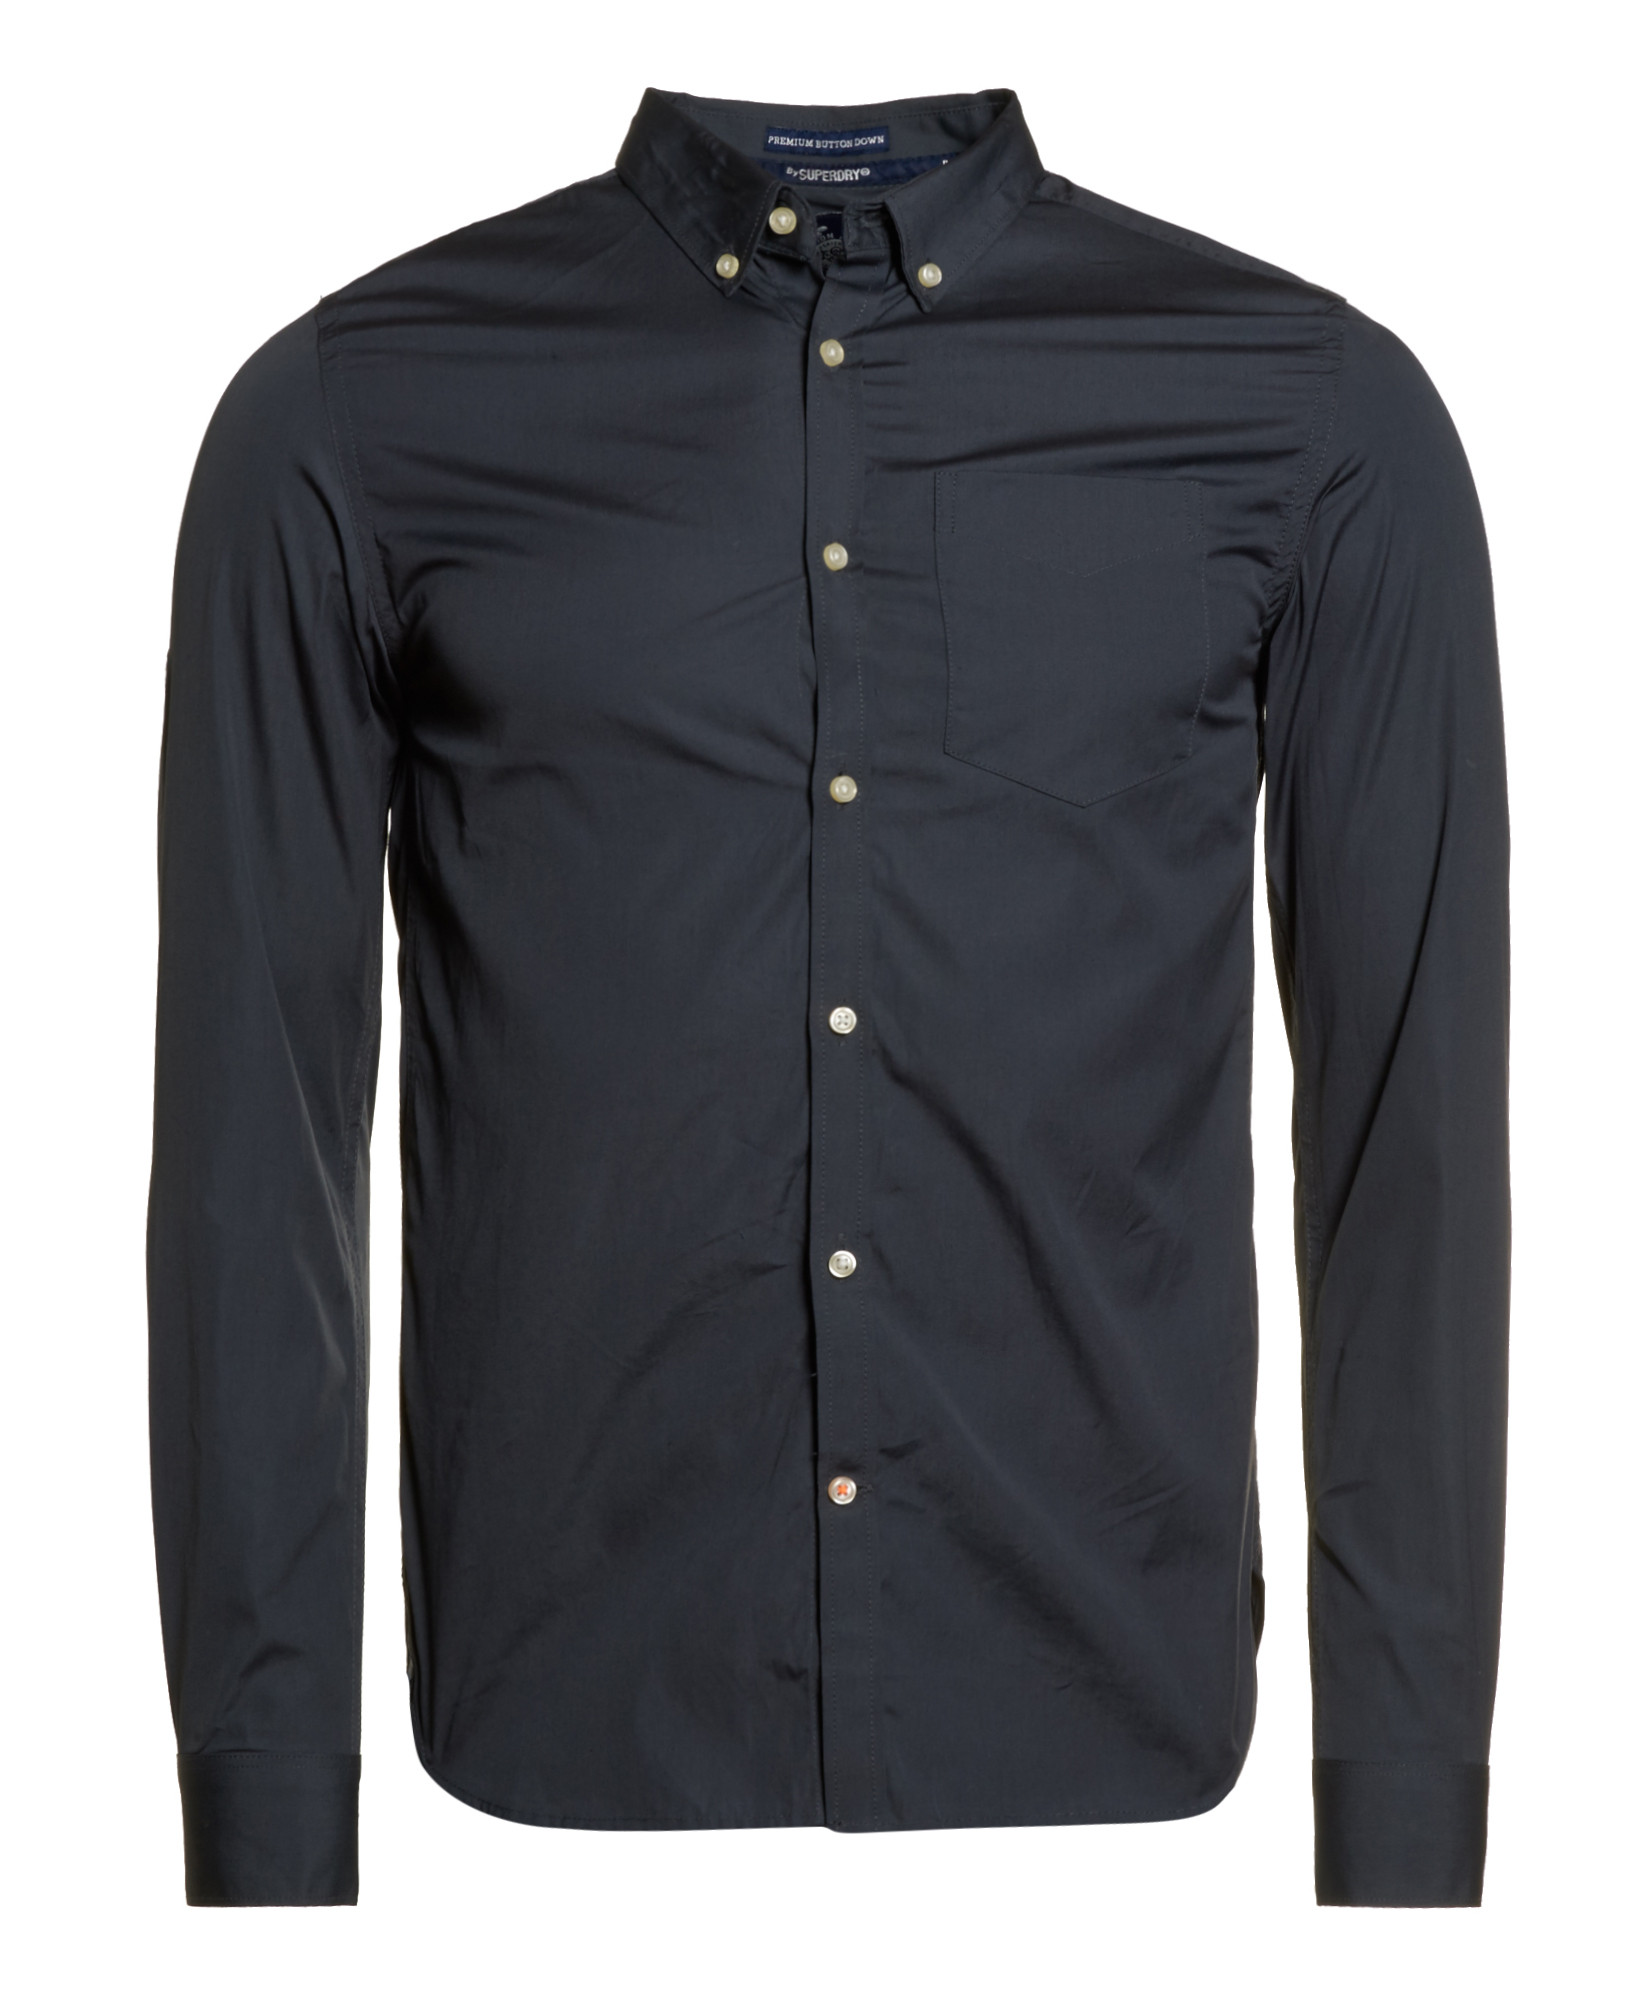 New mens superdry premium button down shirt slate grey ebay for Mens grey button down dress shirt